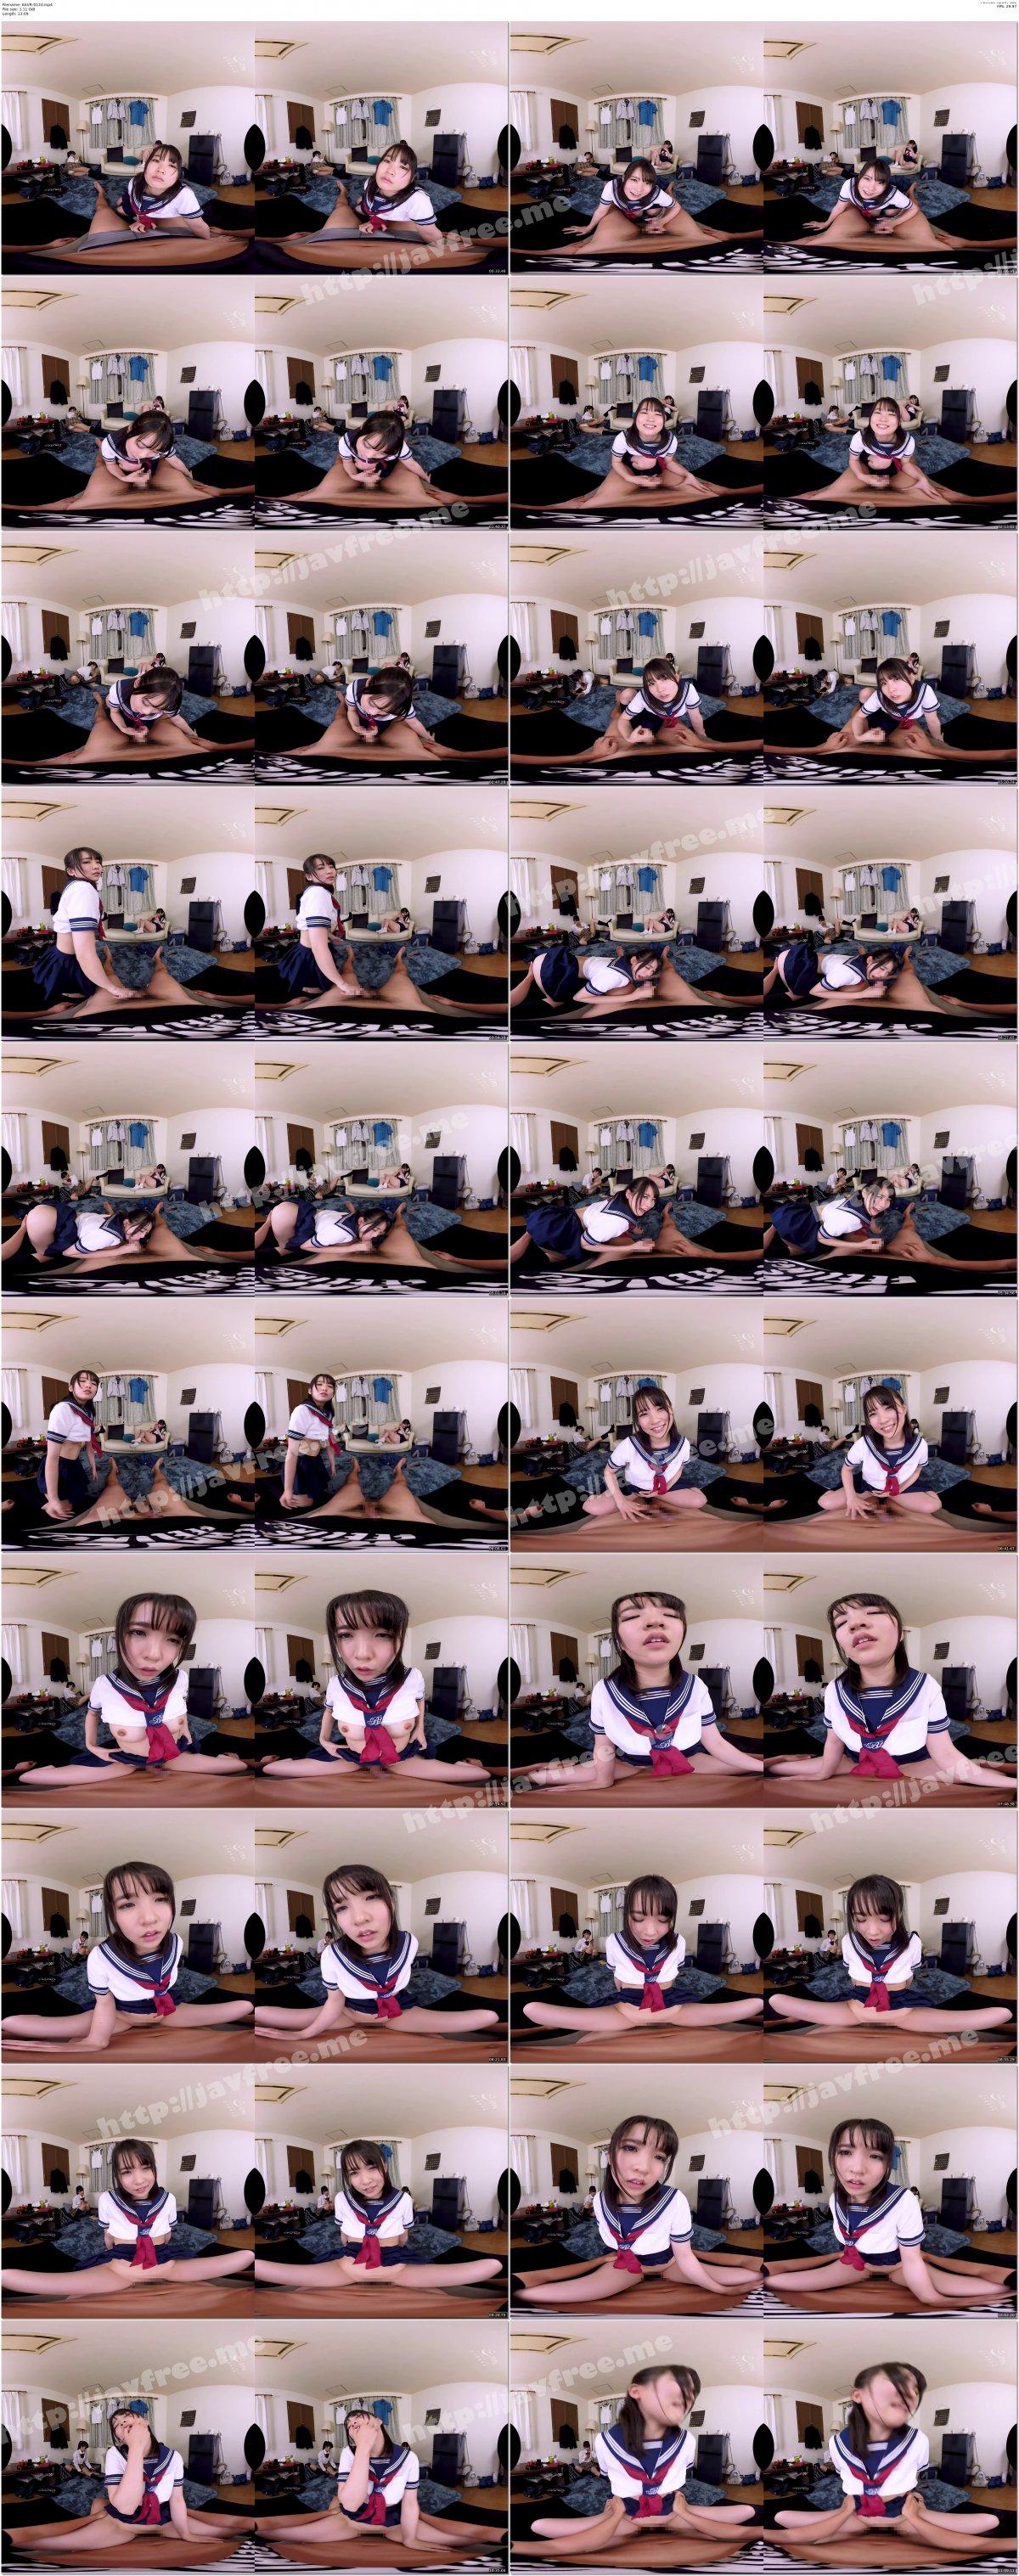 [KAVR-012] 【VR】禁断の女子寮の管理人体験VR 気付いたら…門限に間に合わず駆け込んできた制服美少女の溜まり部屋に!! - image KAVR-012d on https://javfree.me